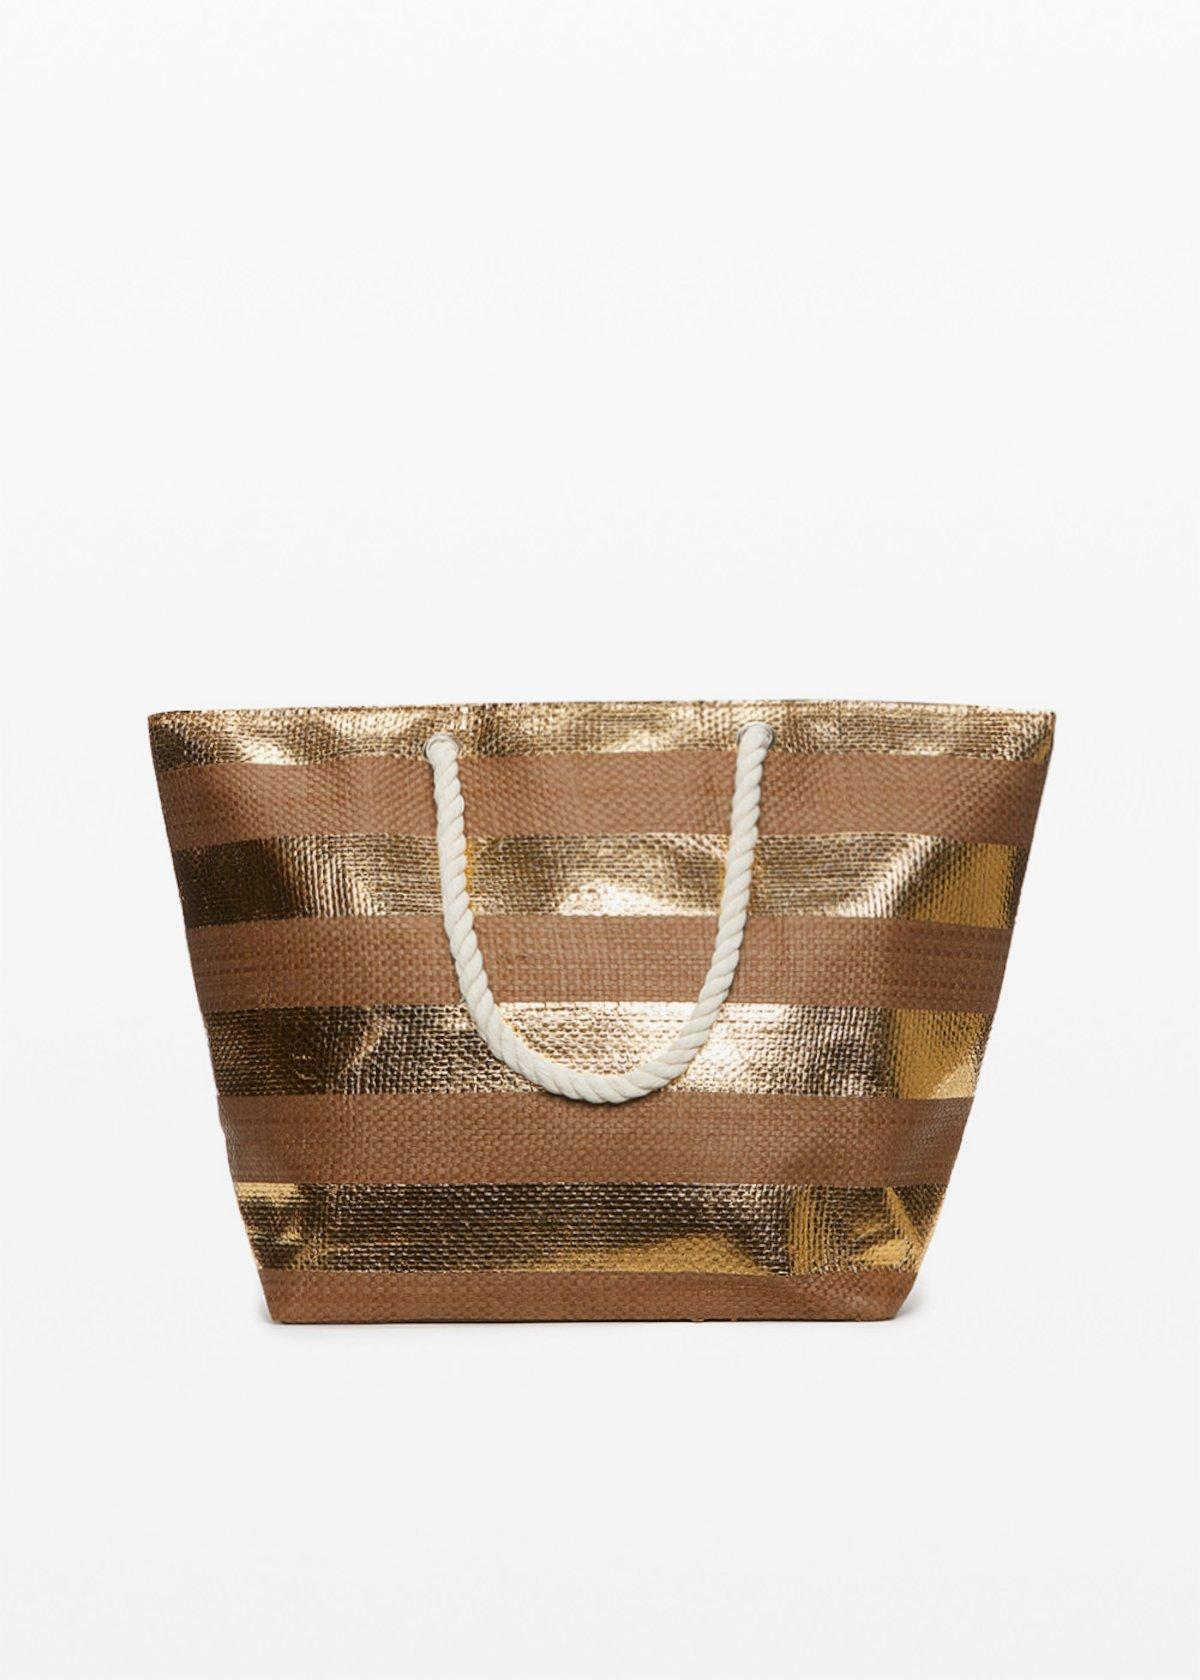 Bowland gold shiny macro stripes fantasy shopping bag - Gold Stripes - Woman